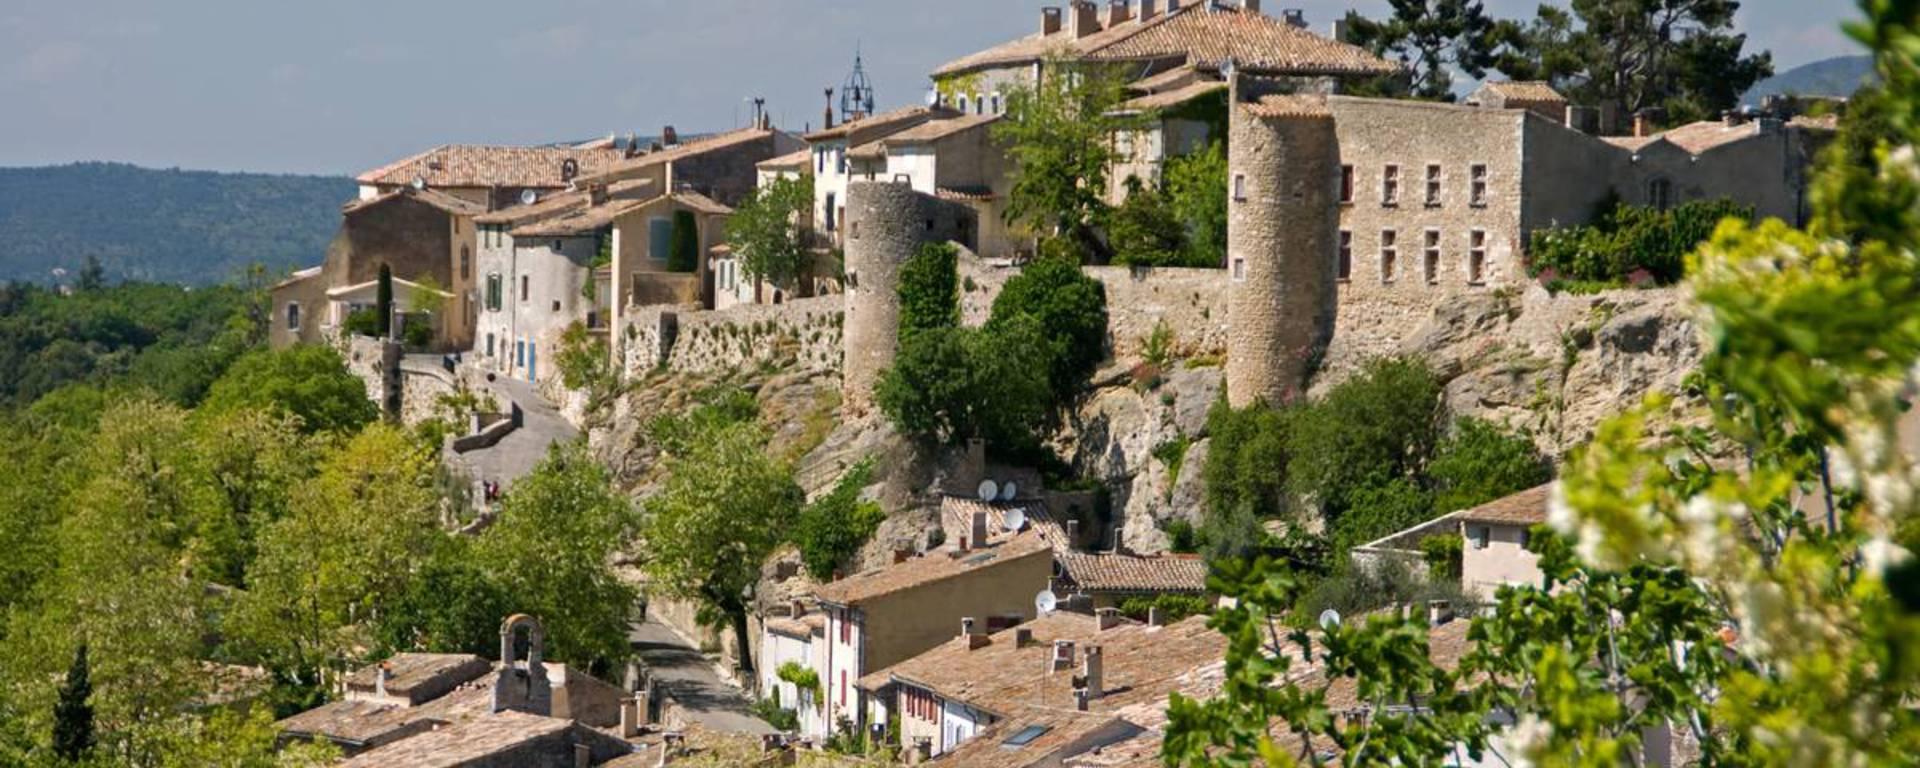 Ménerbes   Village perché   Patrimoine   Luberon